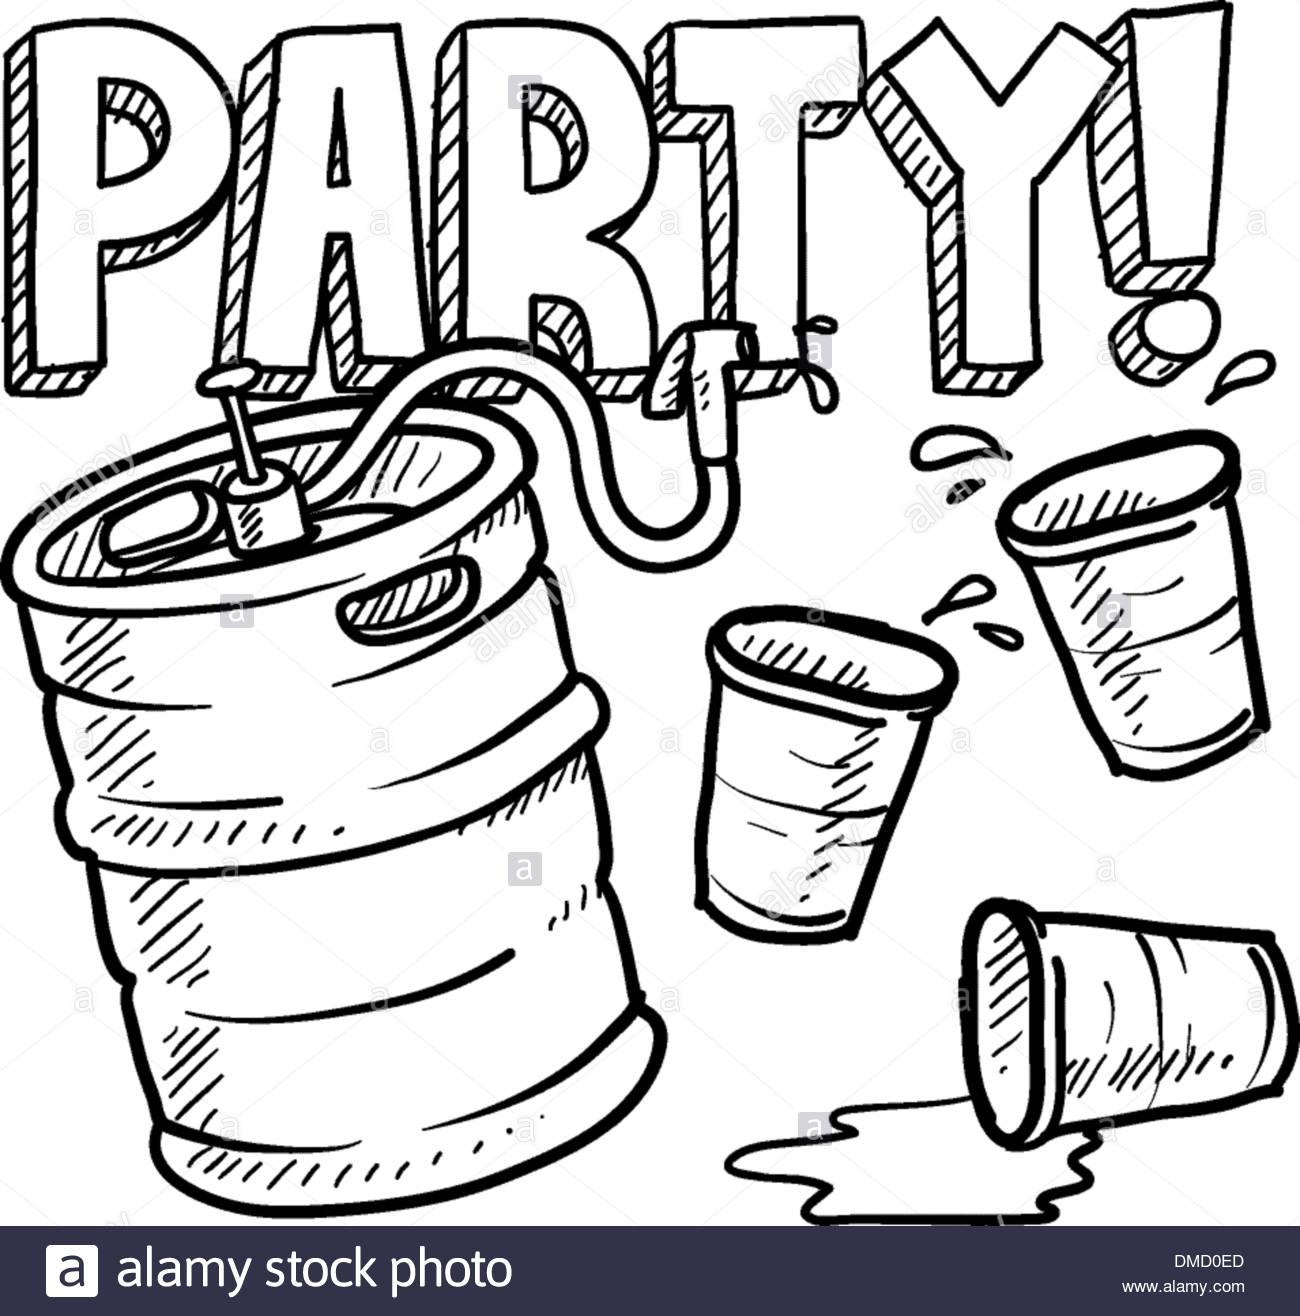 1300x1316 Keg Party Sketch Stock Vector Art Amp Illustration, Vector Image